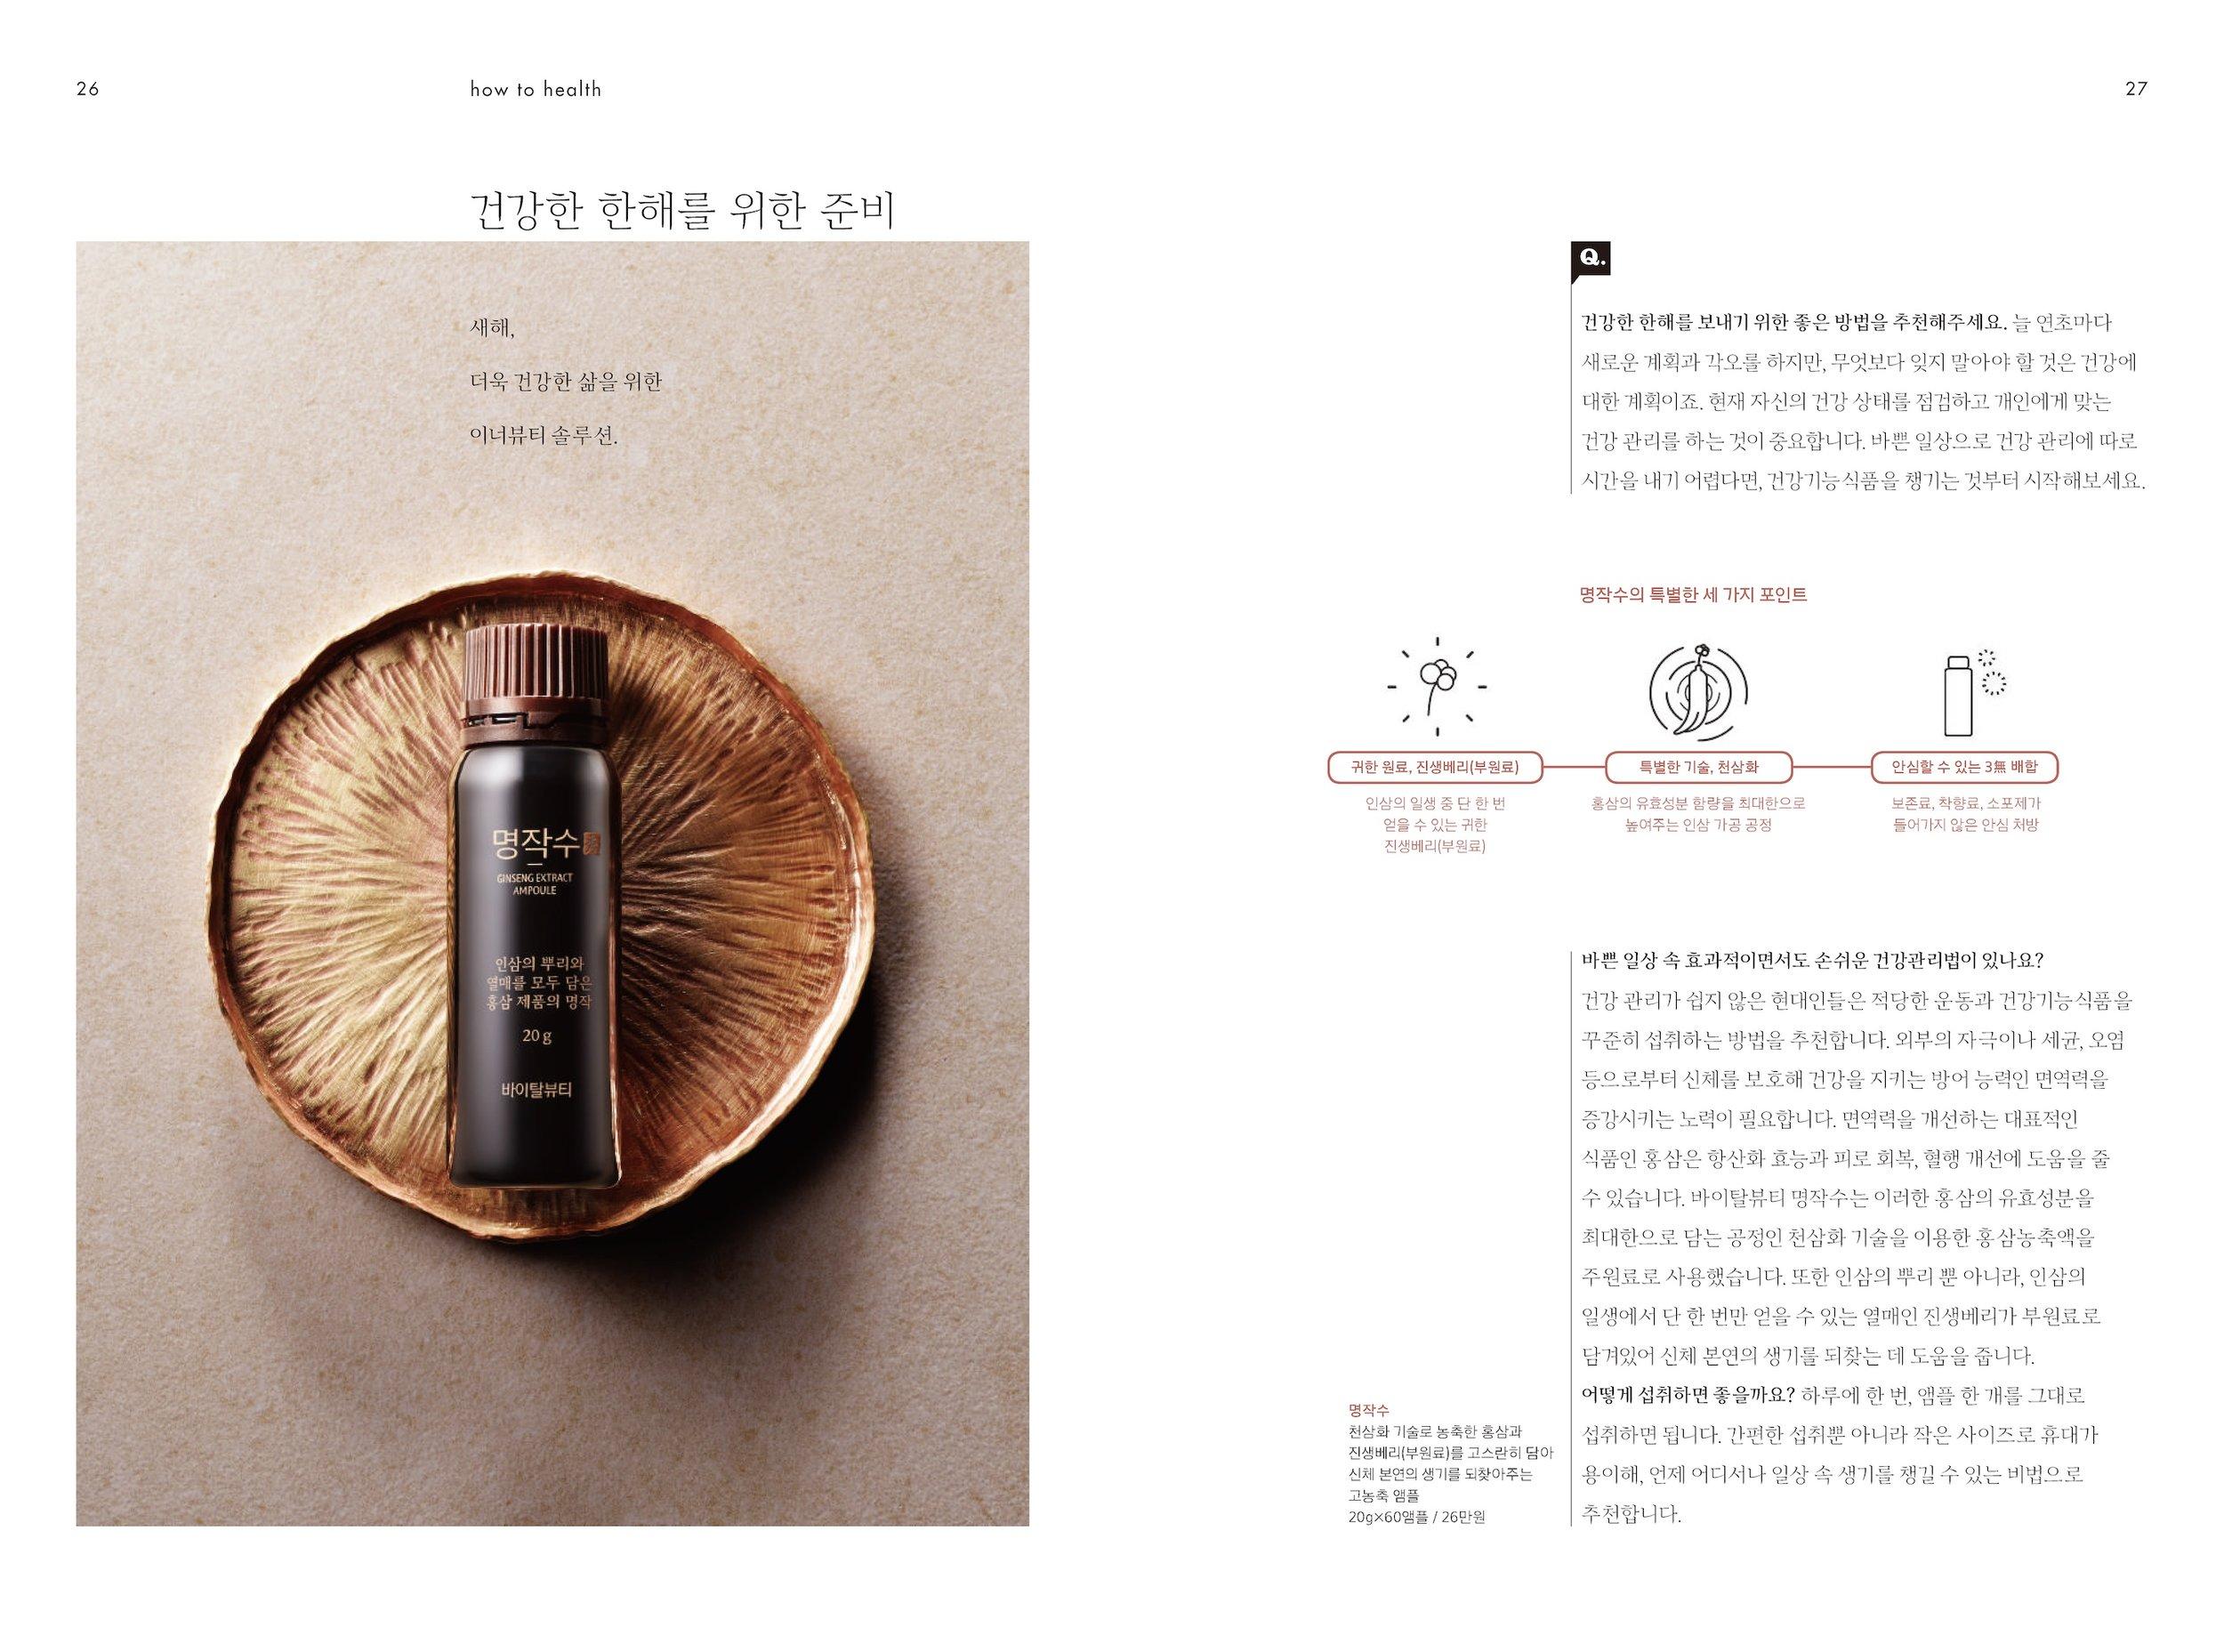 hyangjang-201901_페이지_13.jpeg